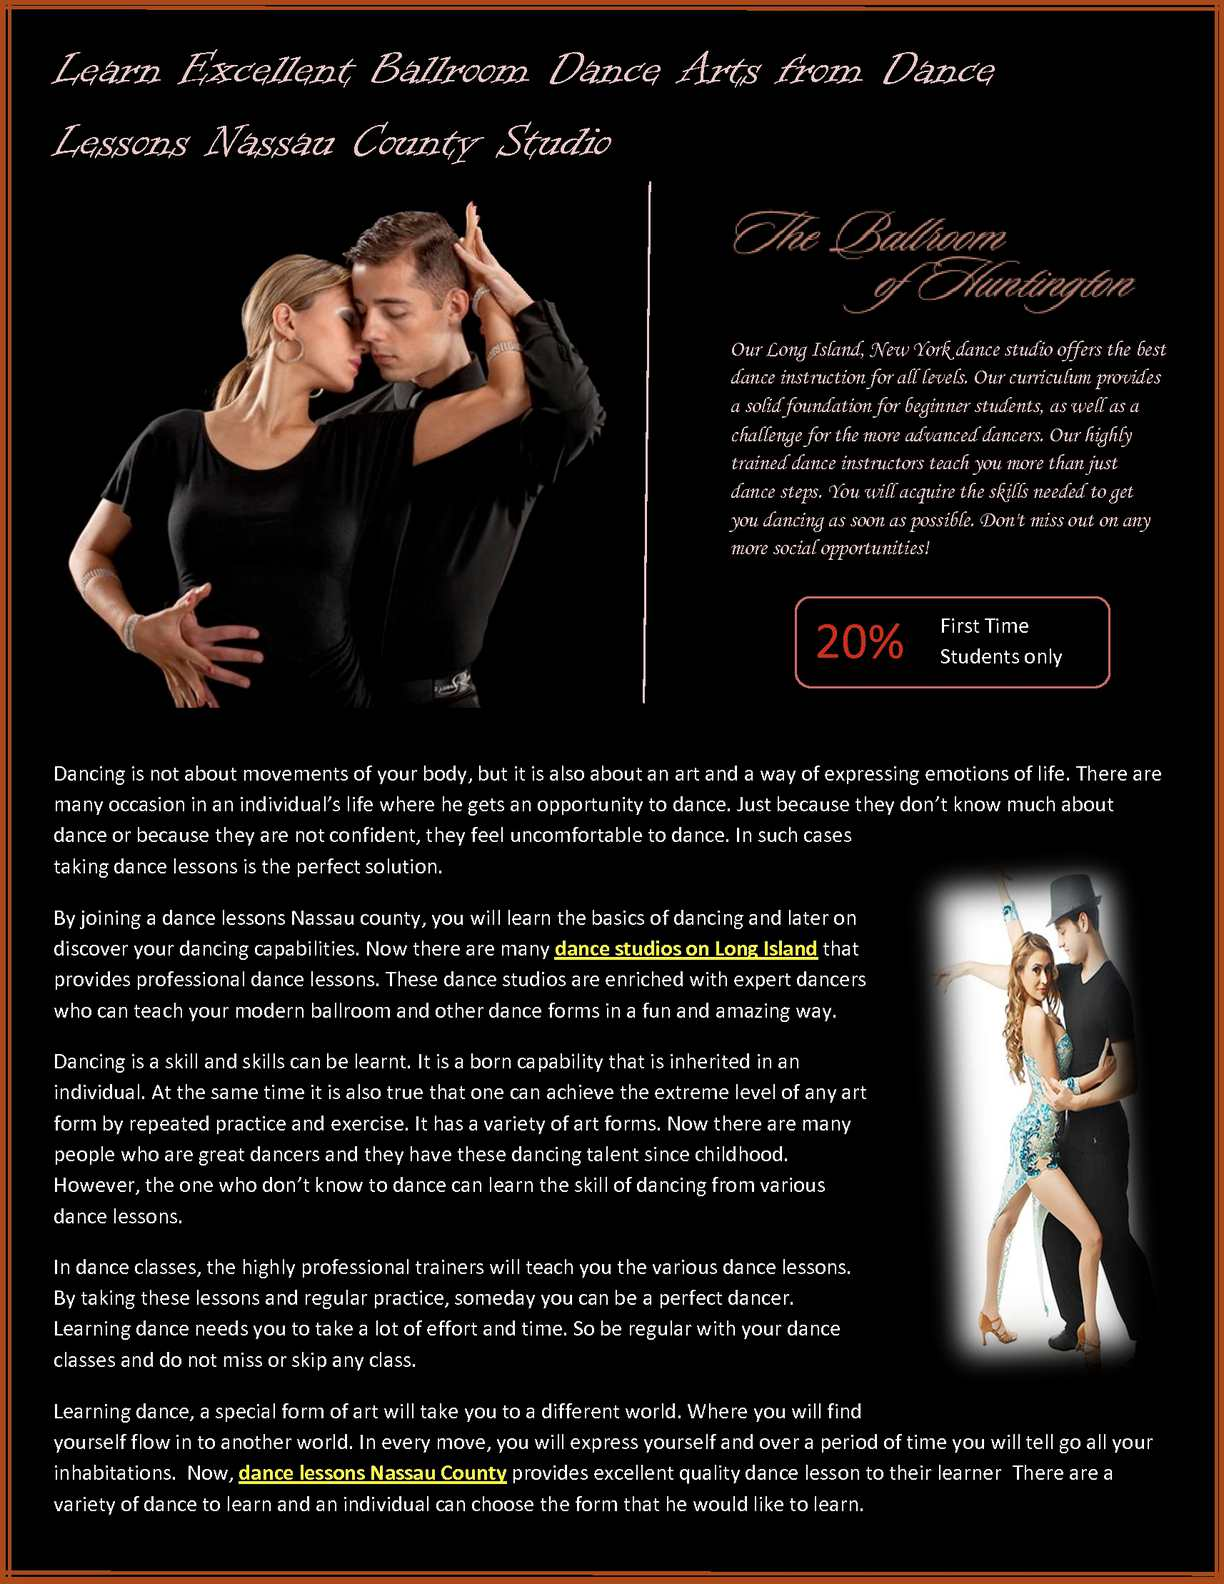 Calaméo - Learn Excellent Ballroom Dance Arts from Dance